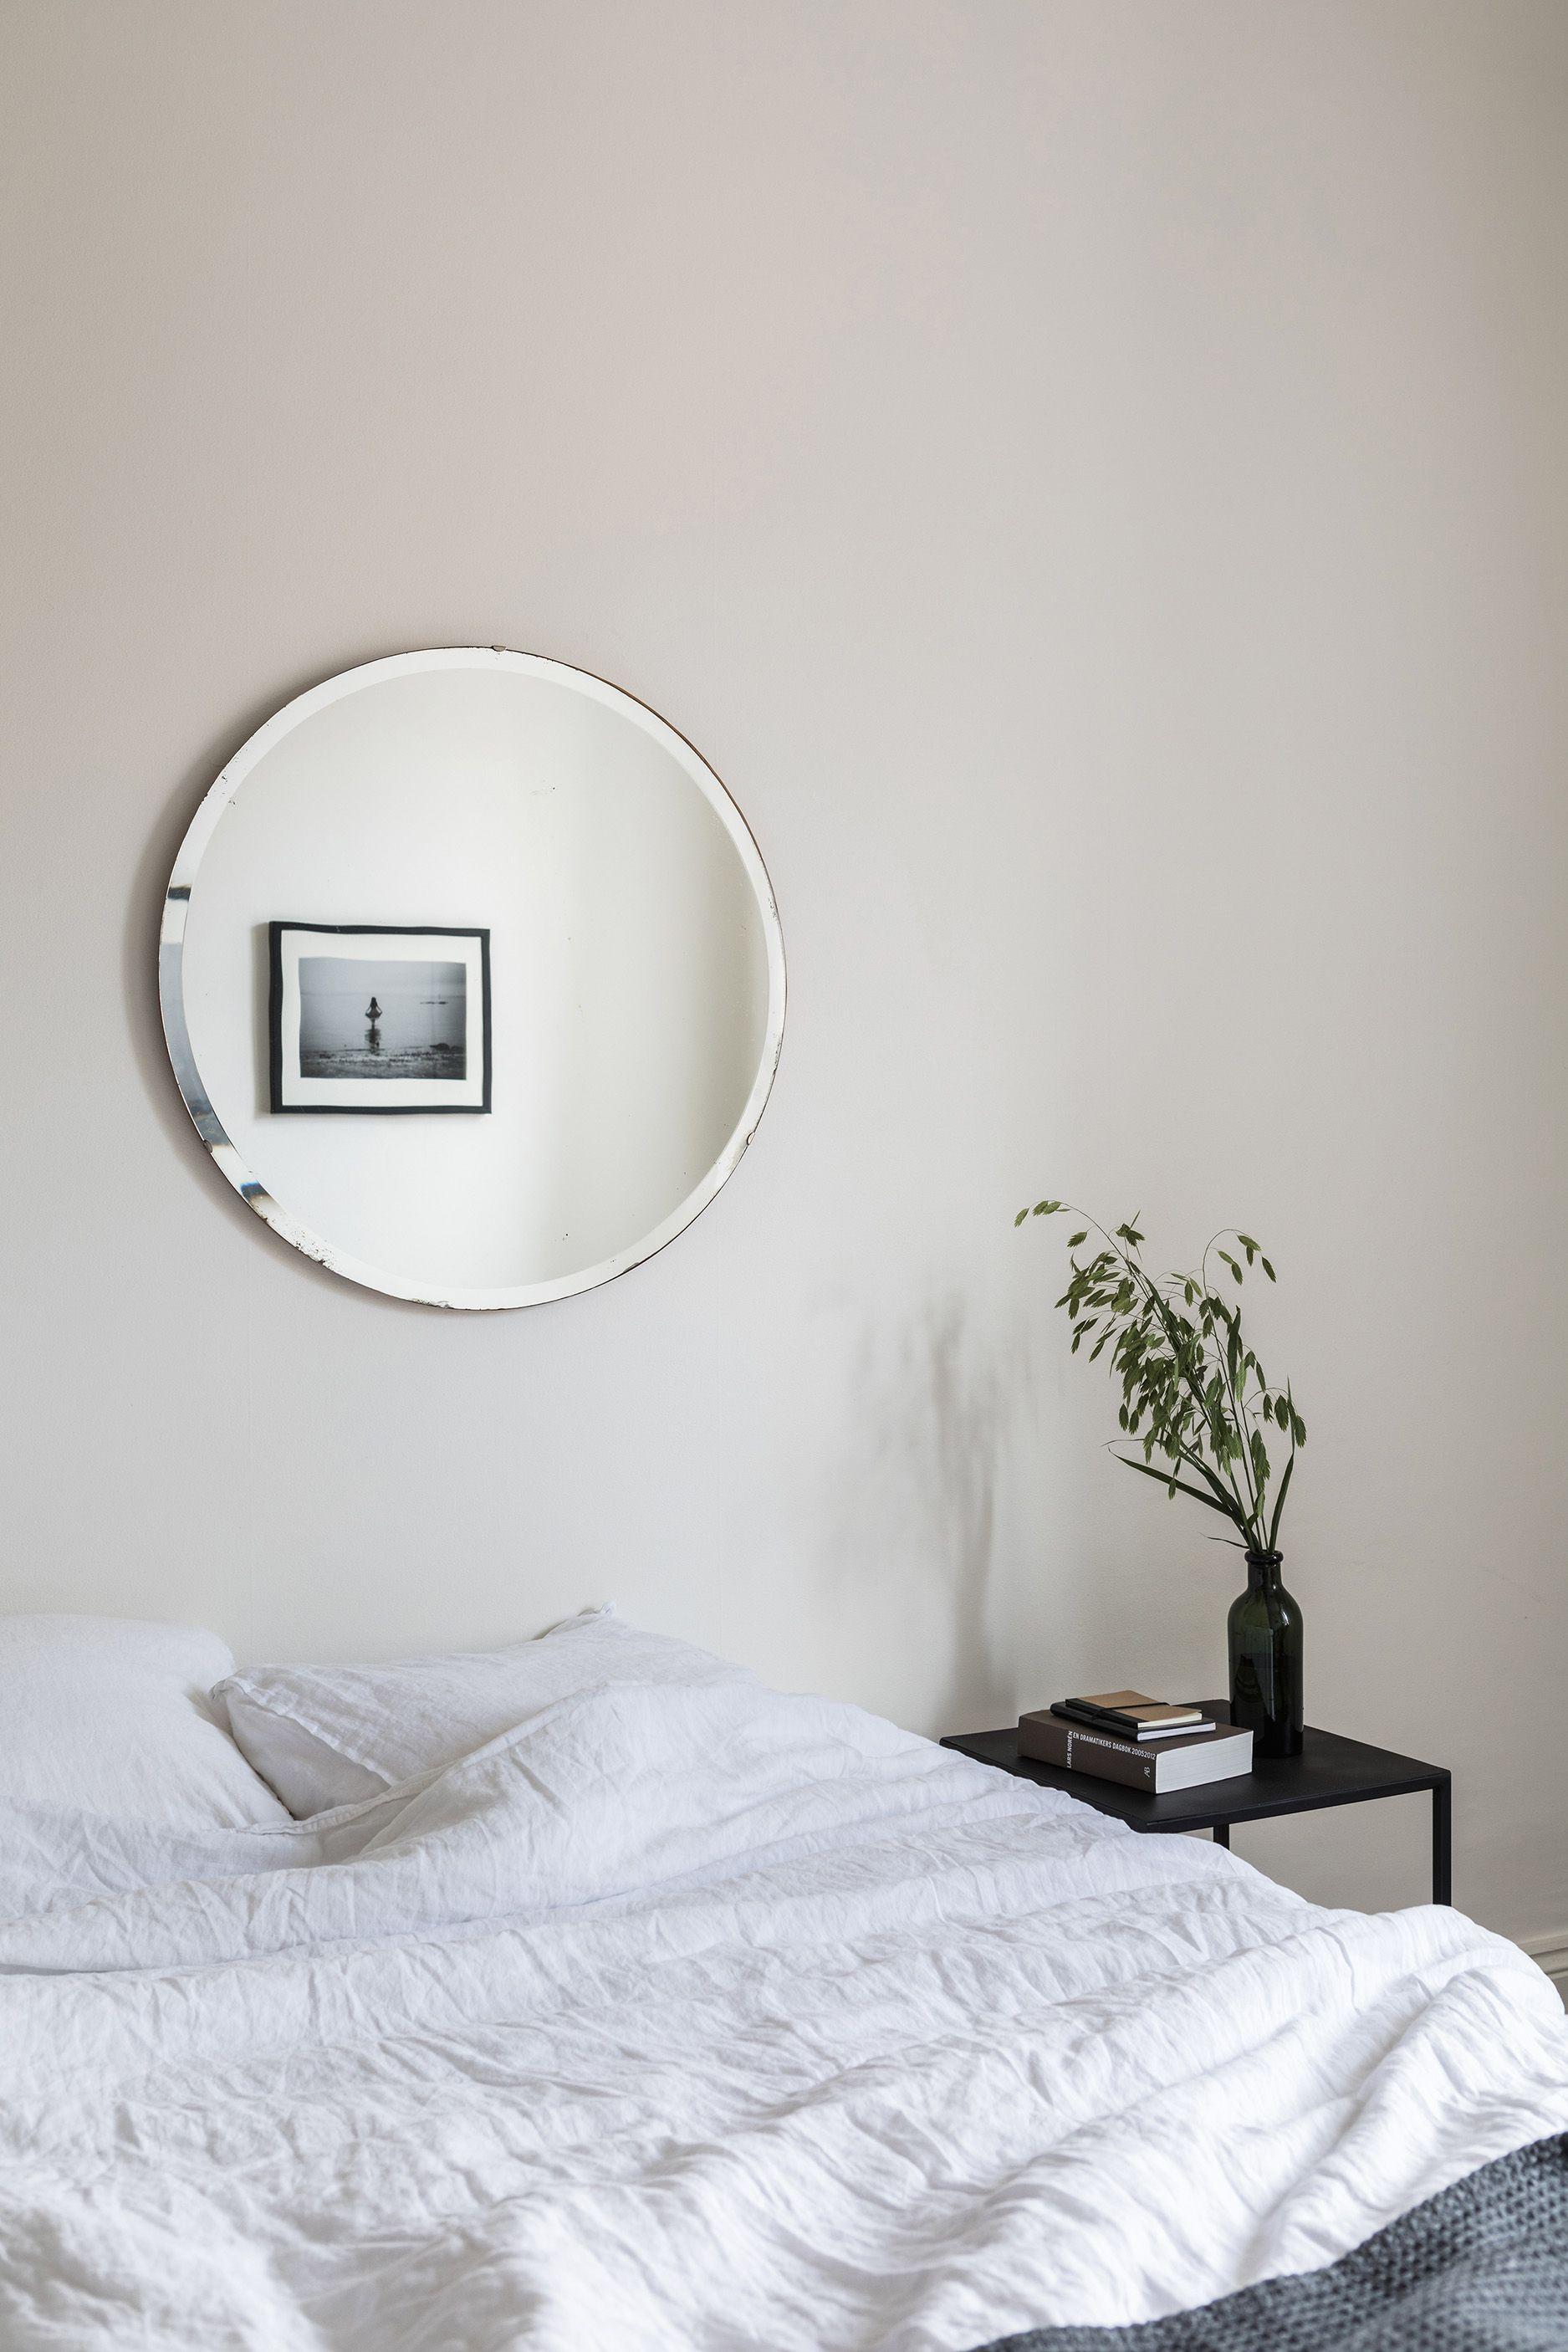 33 Minimalist Bedroom Ideas and Design Tips , Budget